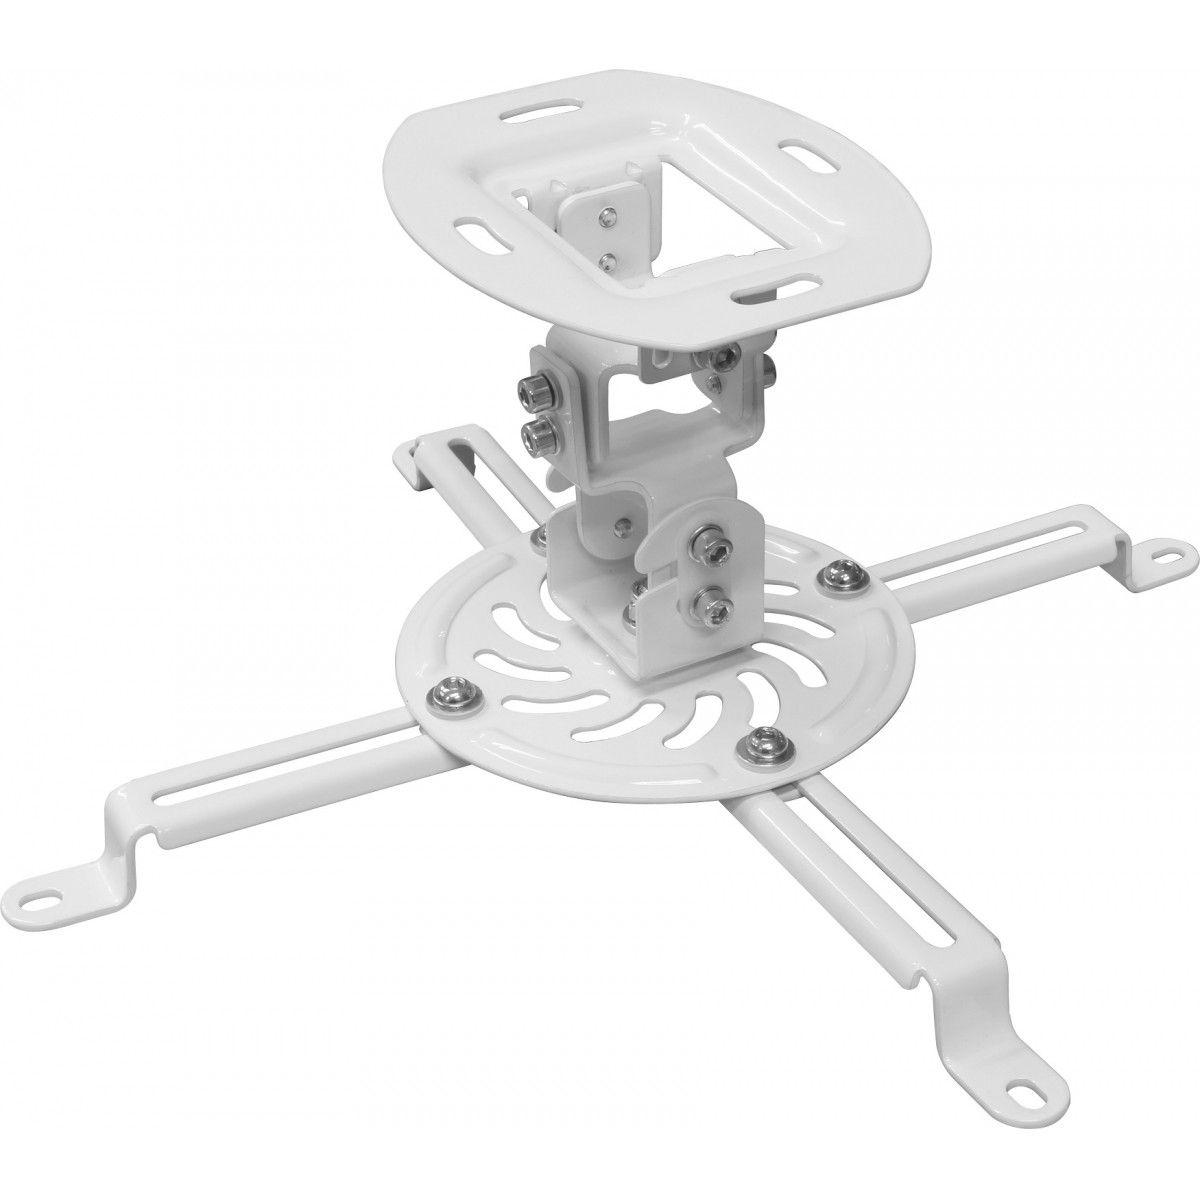 Suporte Universal - PRO100 ELG para projetor